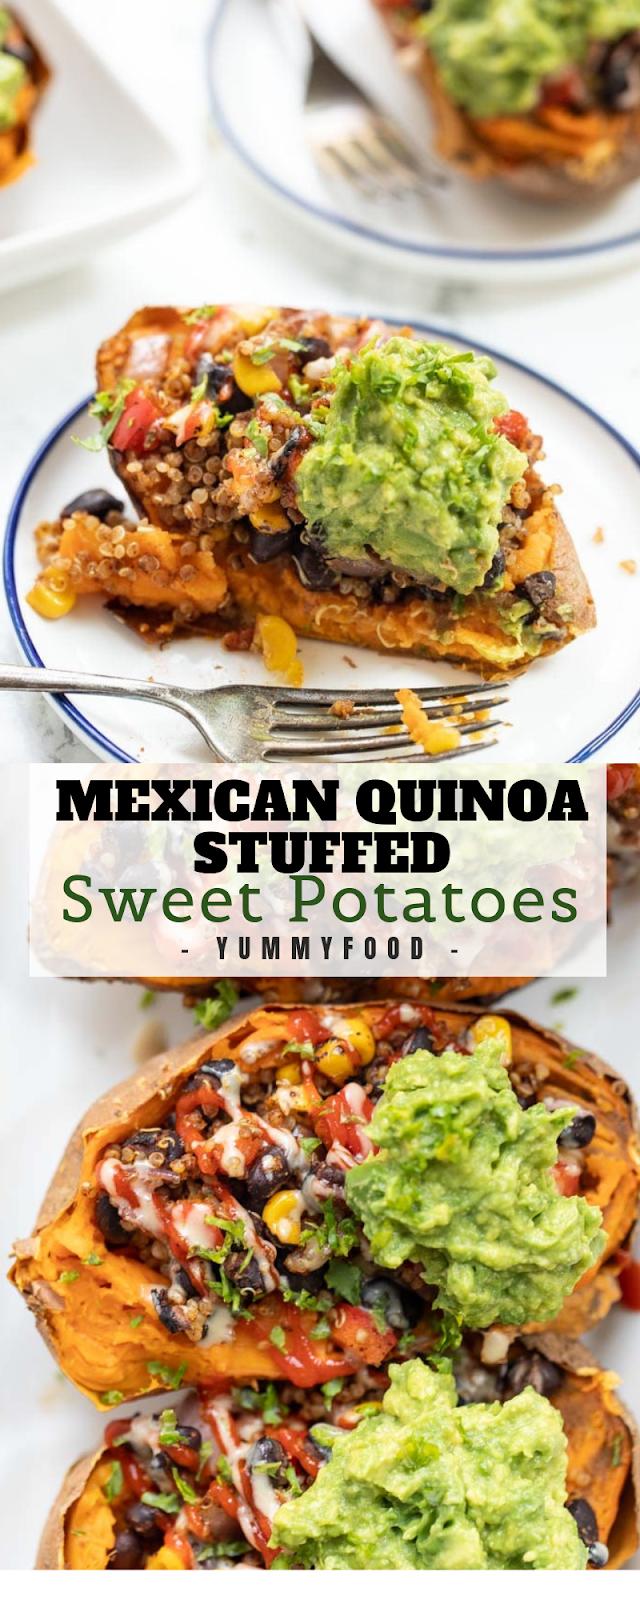 Mеxісаn Quinoa Stuffеd Sweet Pоtаtоеѕ